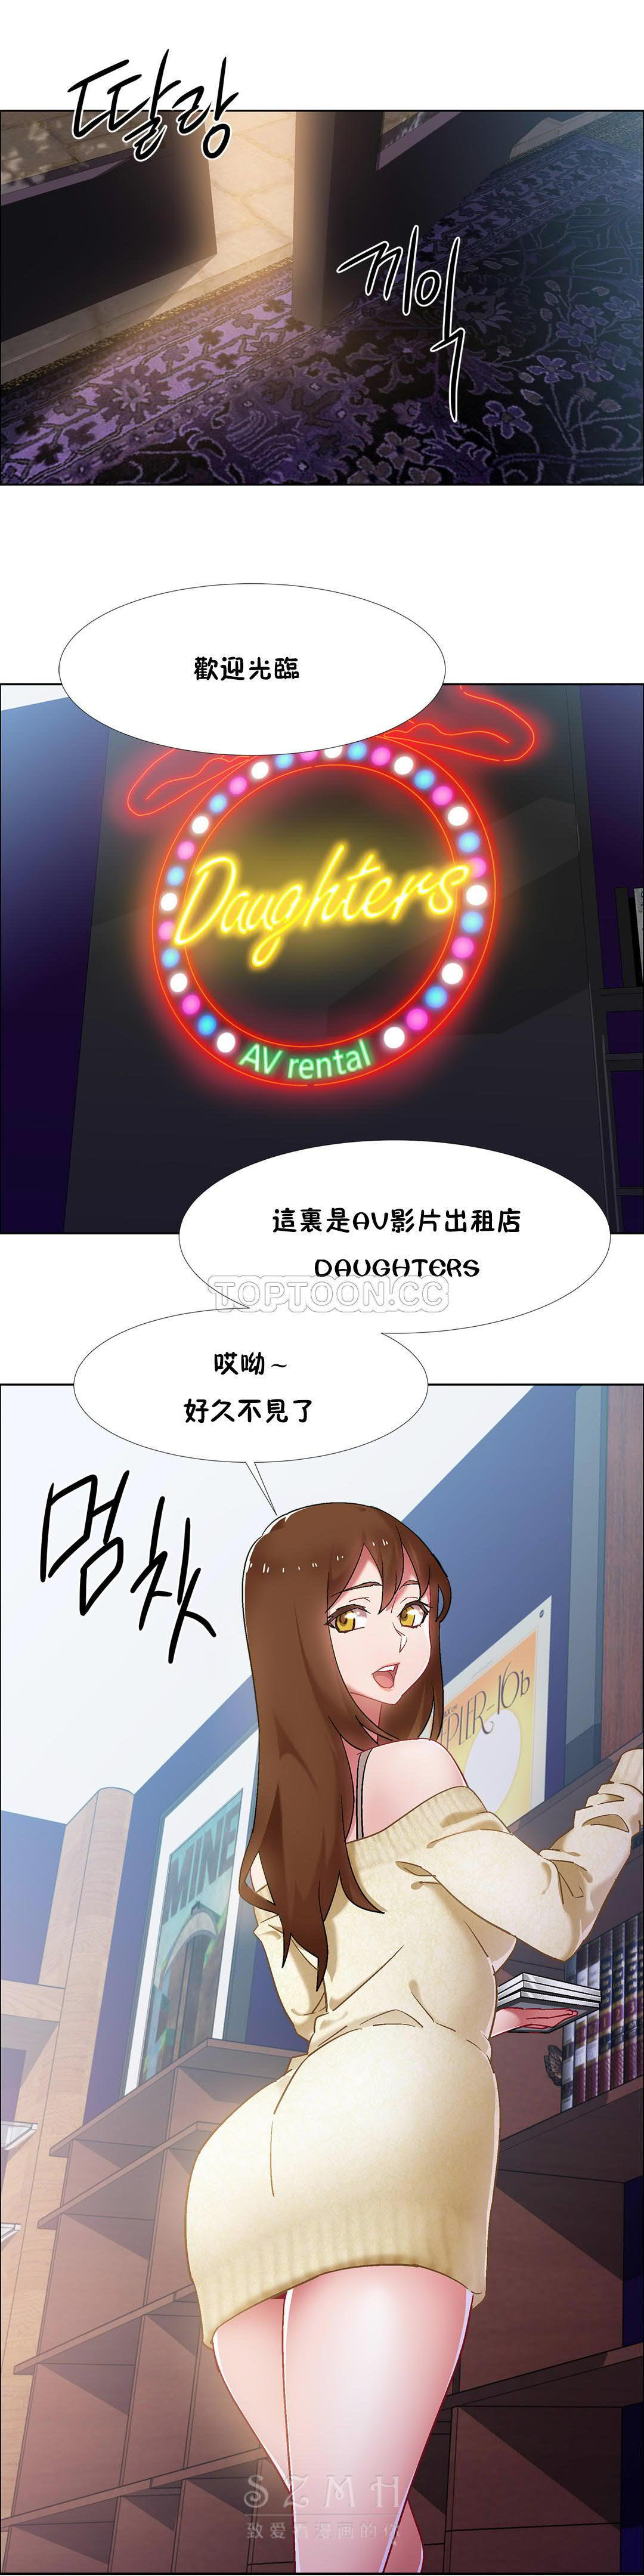 [Studio Wannabe] Rental Girls | 出租女郎 Ch. 33-58 [Chinese]  第二季 完结 1